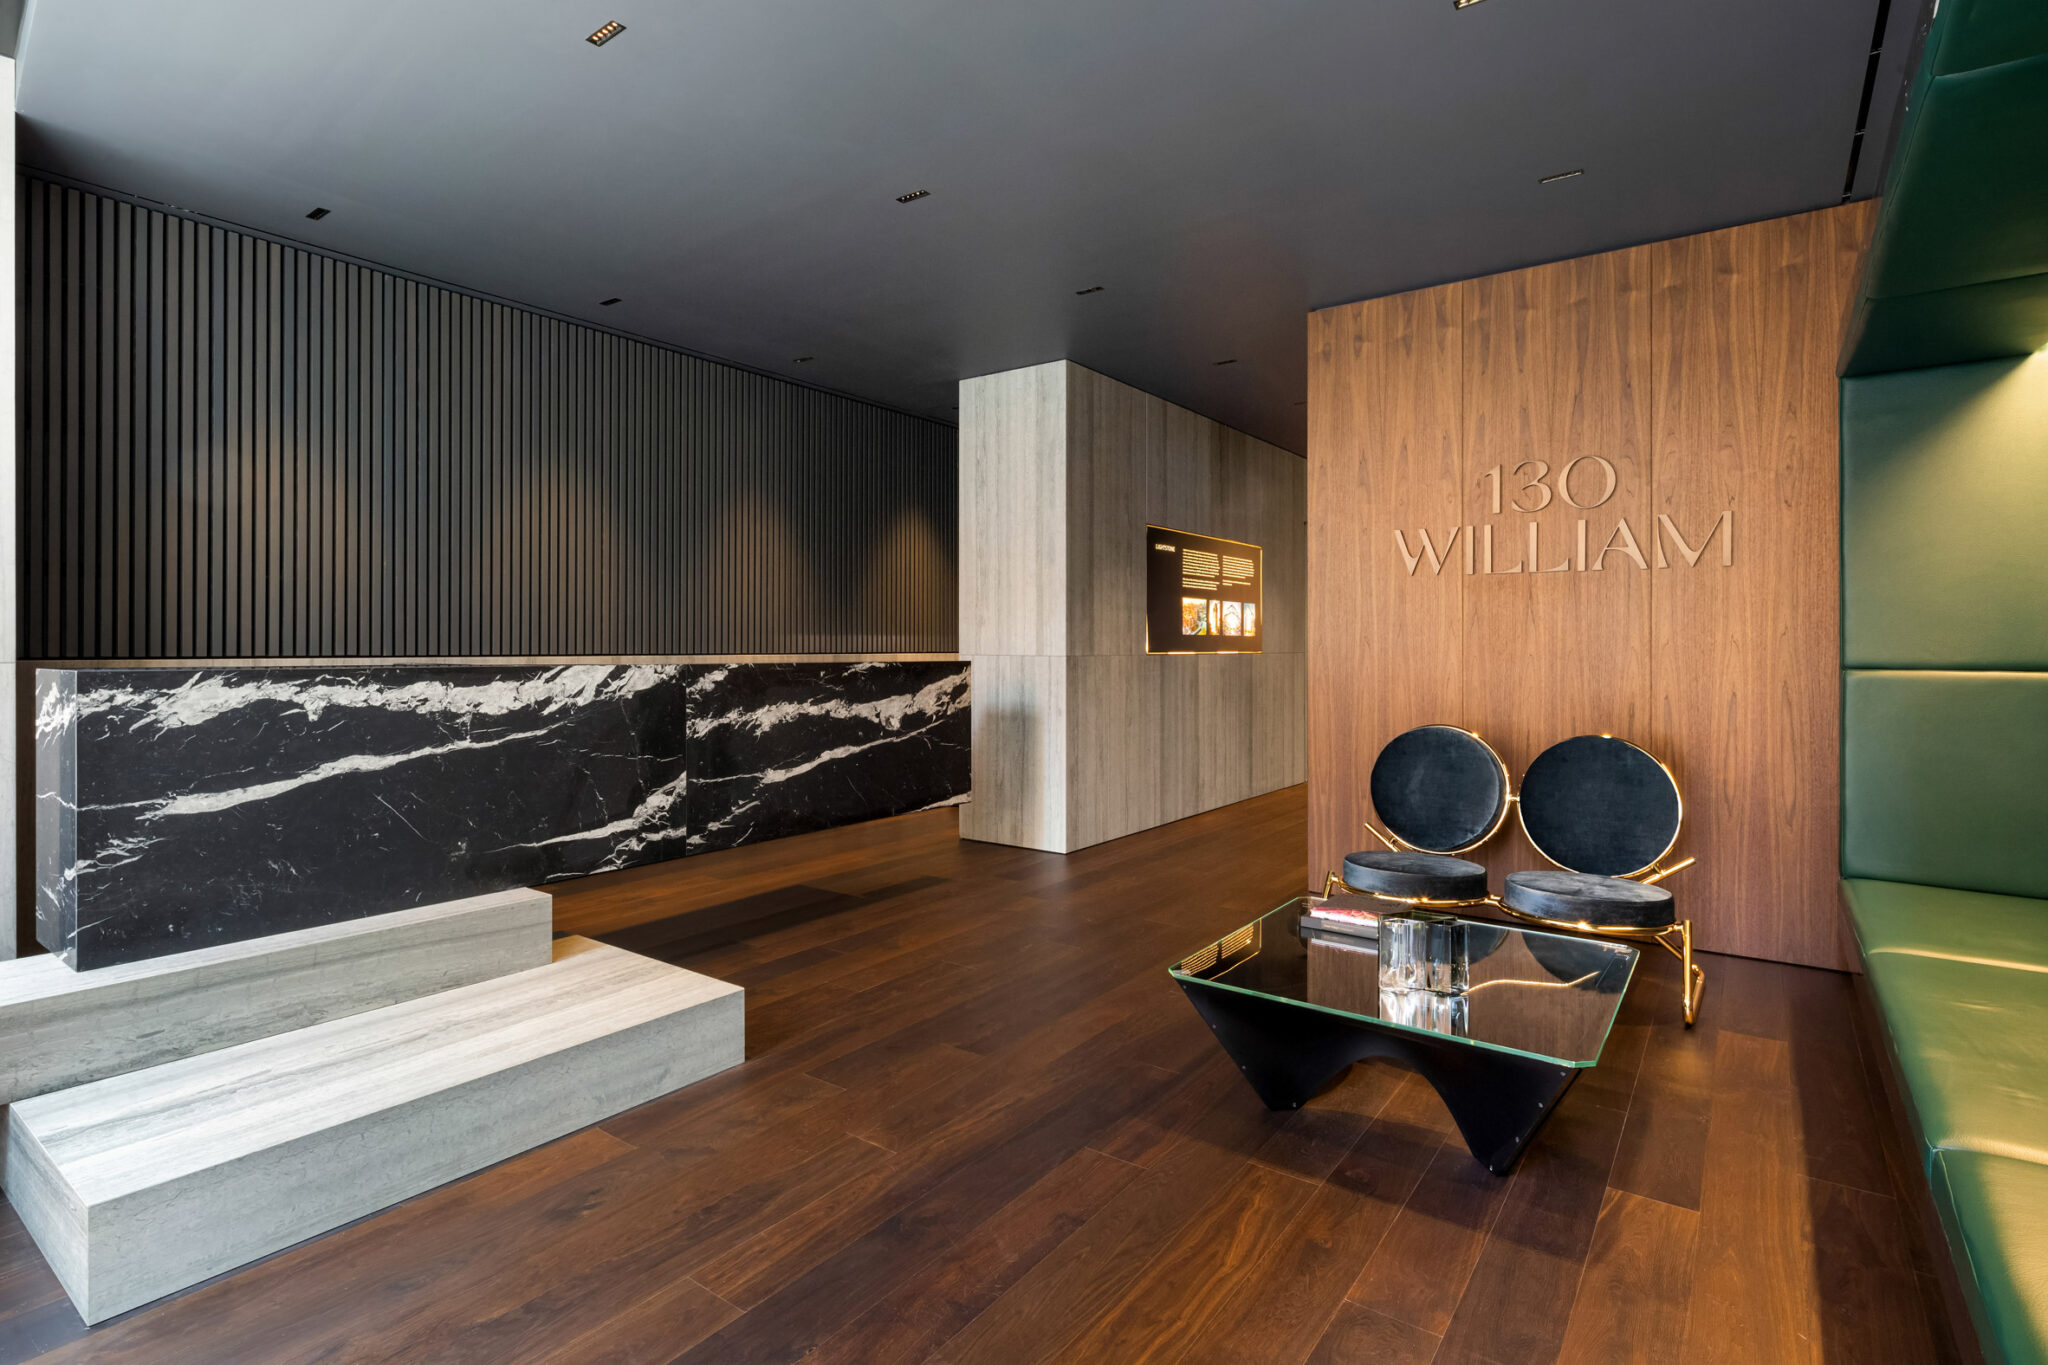 130-william-david-adjaye-interiors-update-new-york-usa_dezeen_2364_col_0